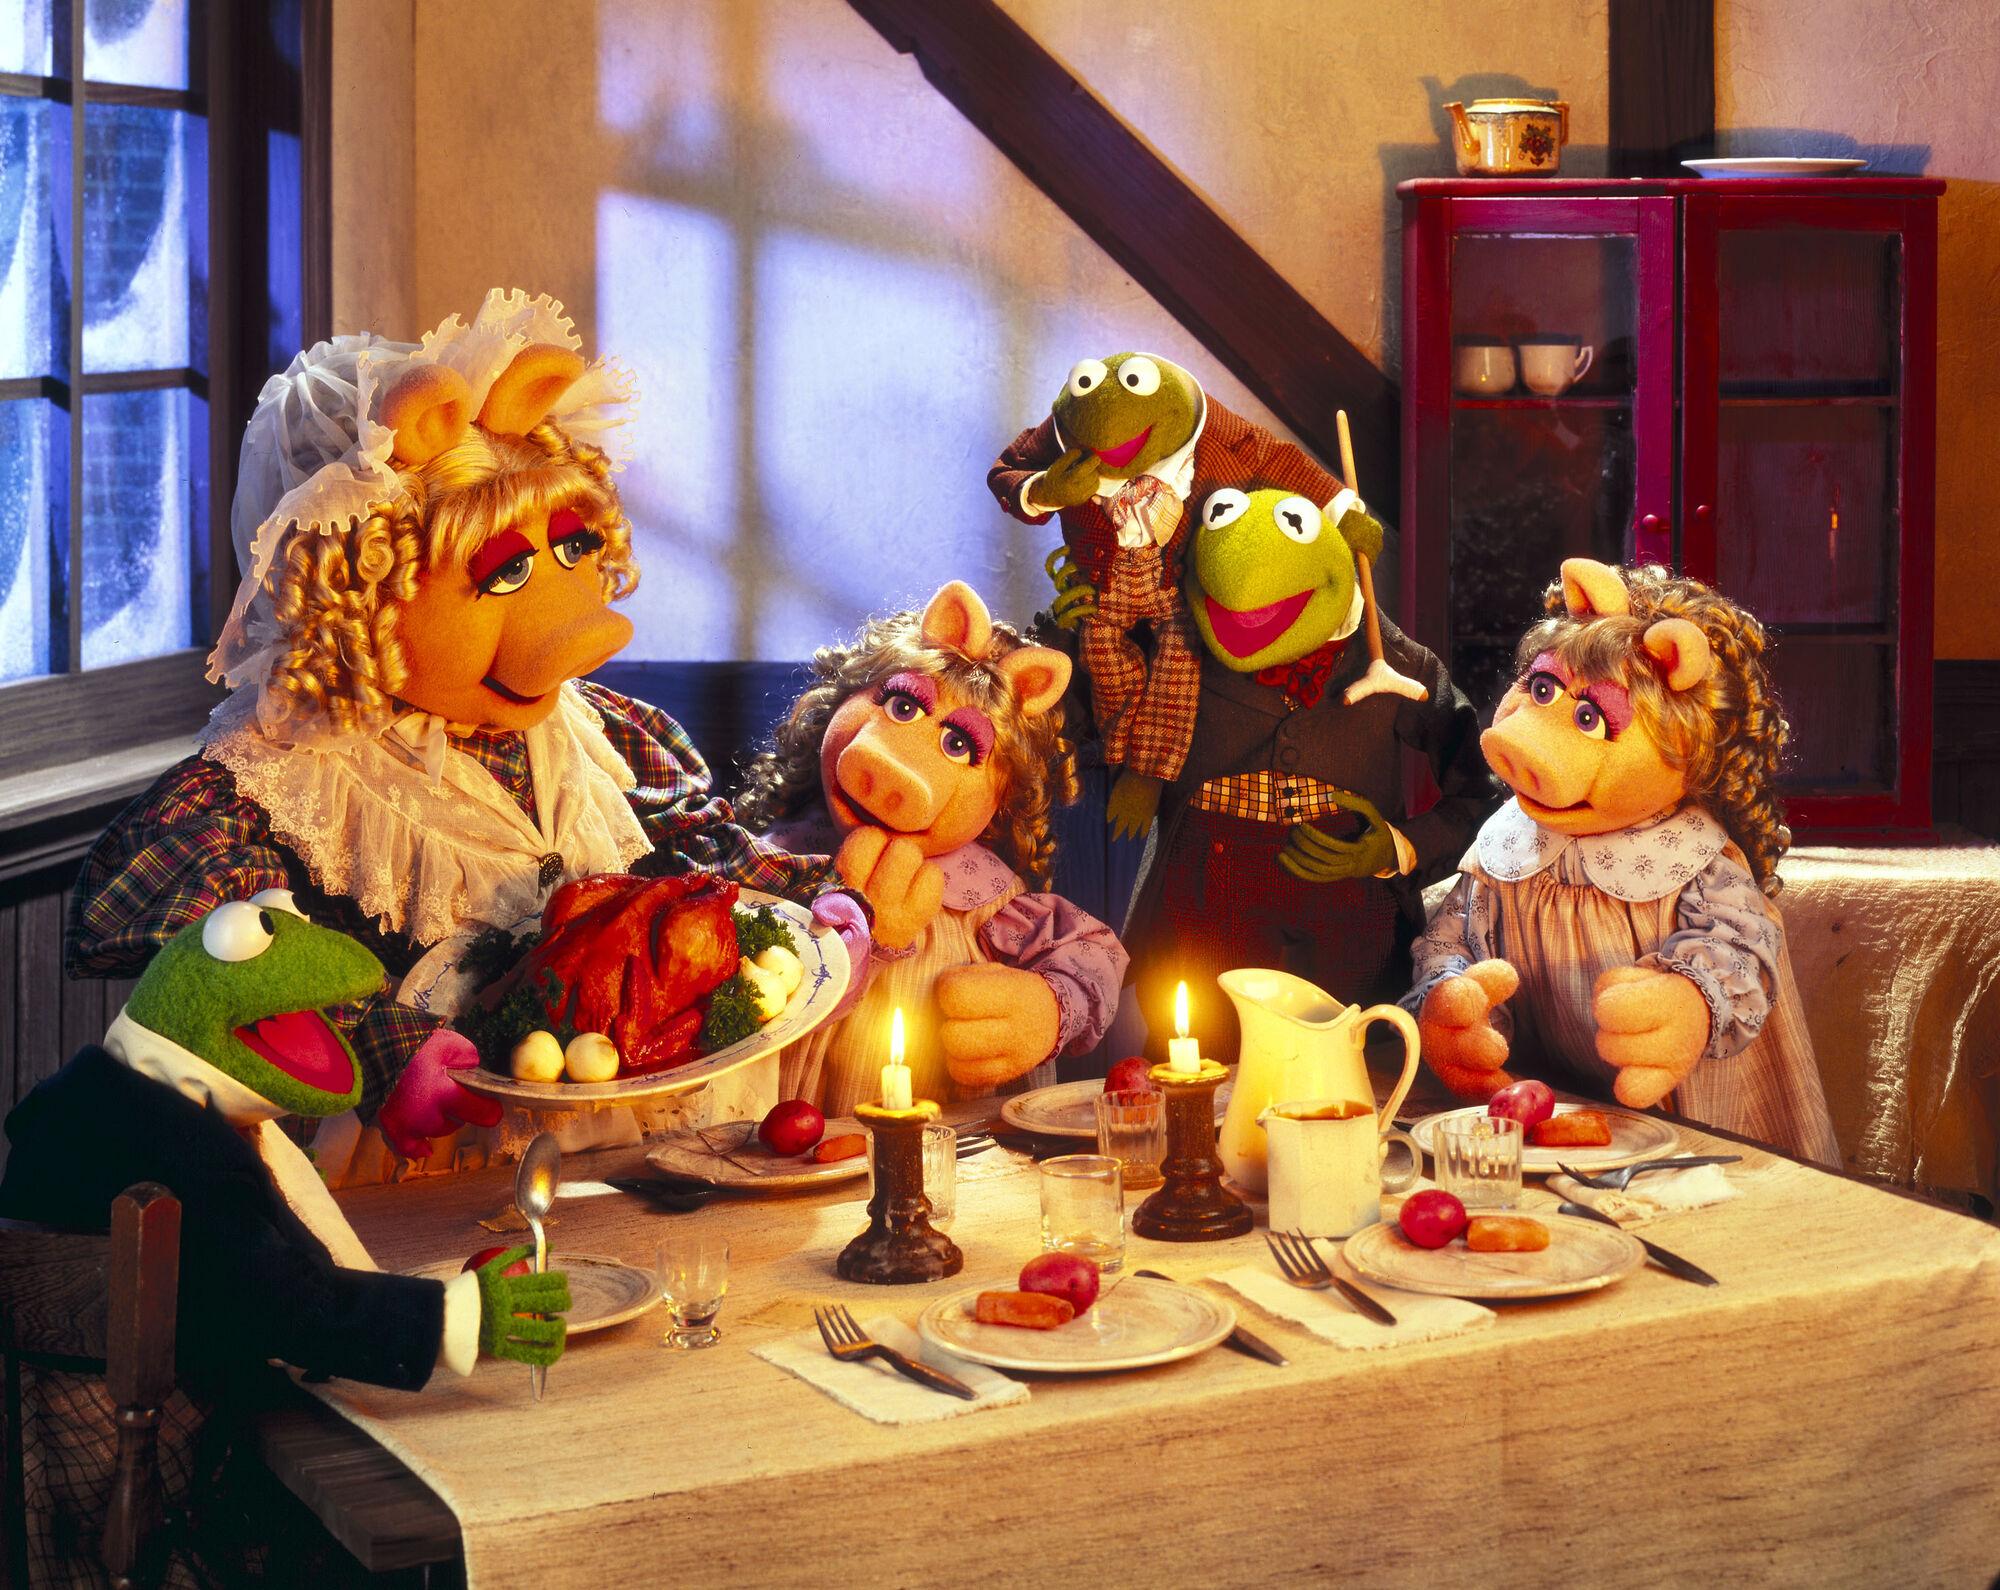 Kermit the Frog and Miss Piggy\'s offspring | Muppet Wiki | FANDOM ...